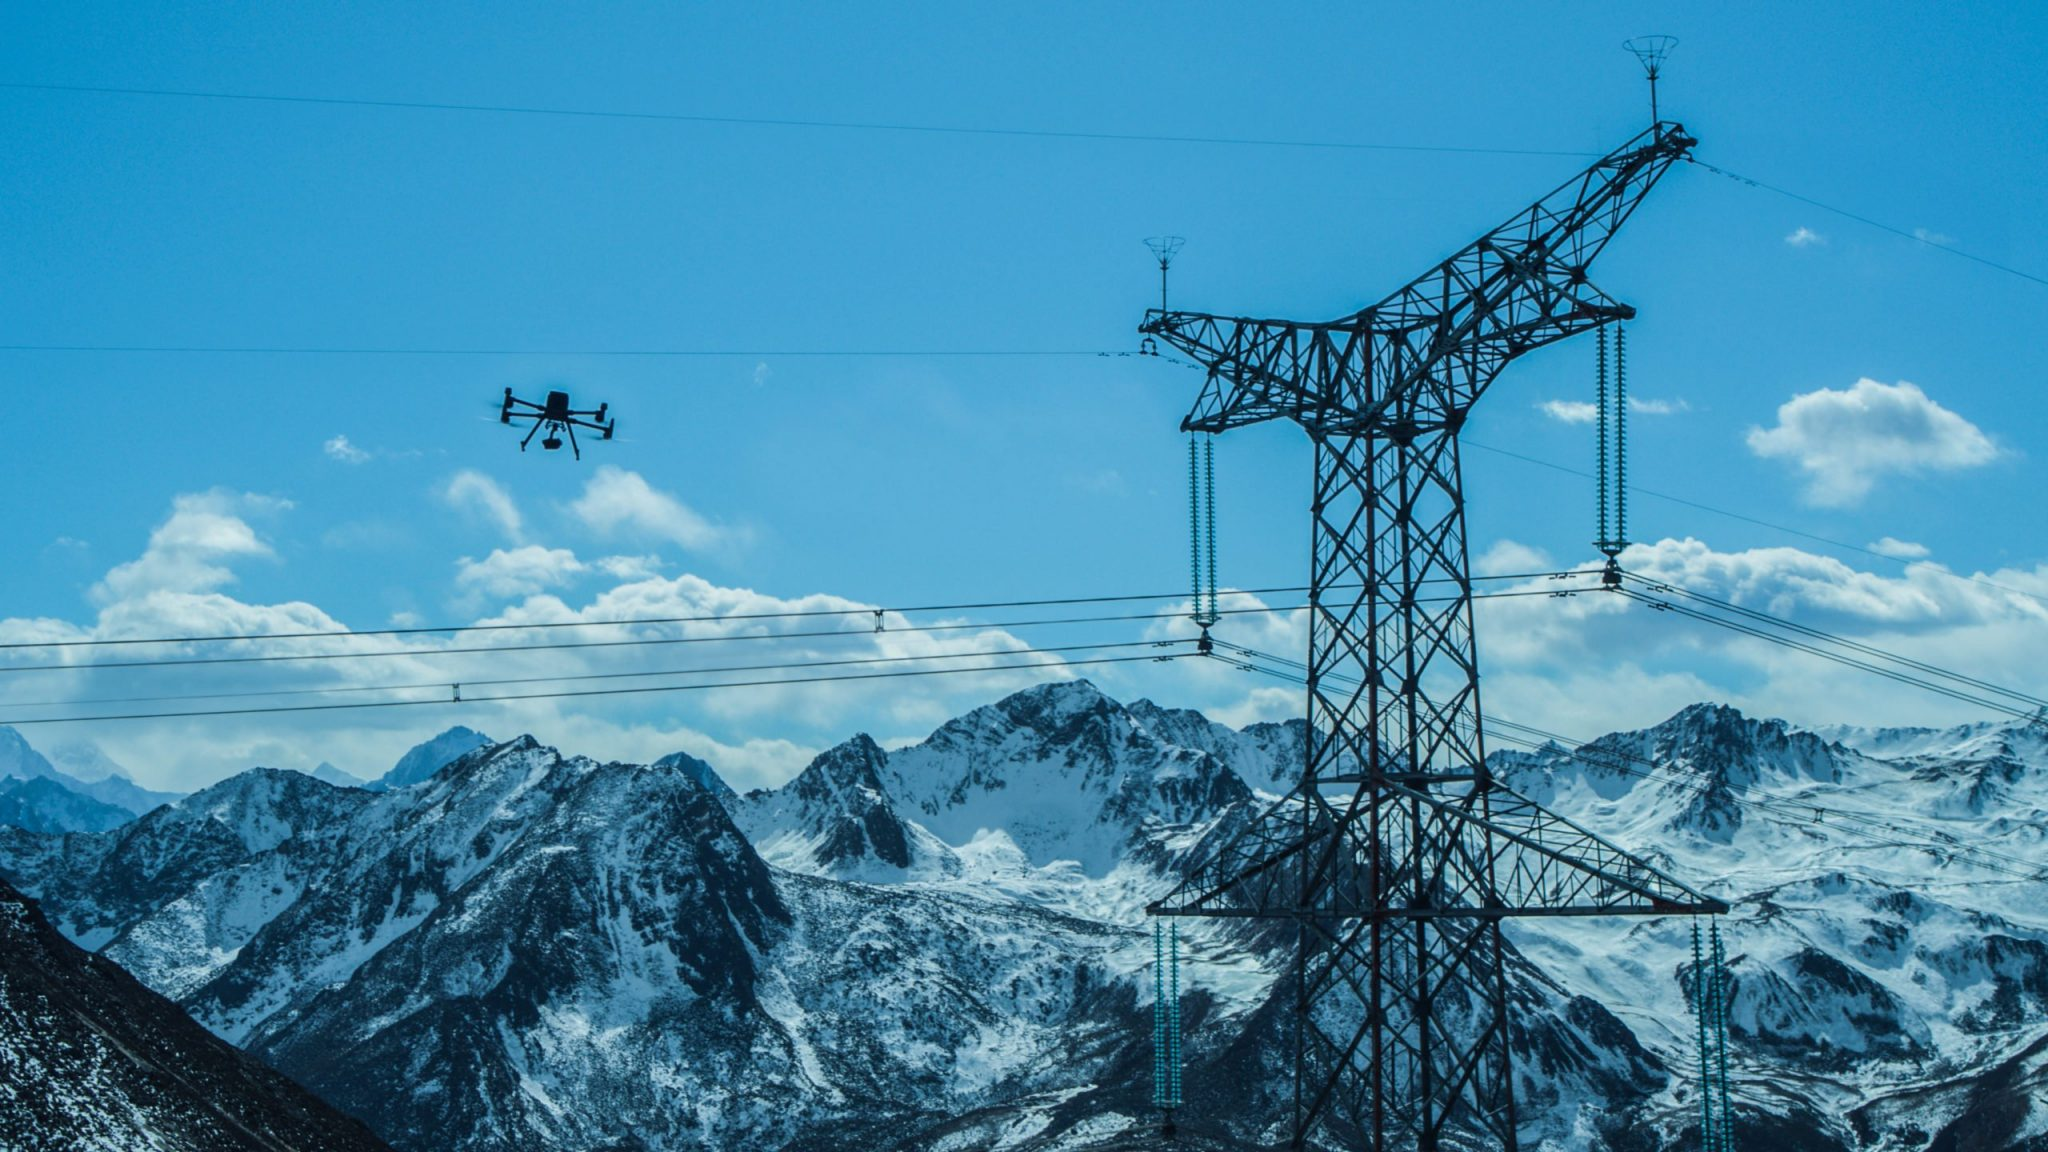 DJI-M300-RTK-inspecting-power-lines-scaled-AYQ3WY-E8Q63E9US-E83YE8YU-38EYUI3W